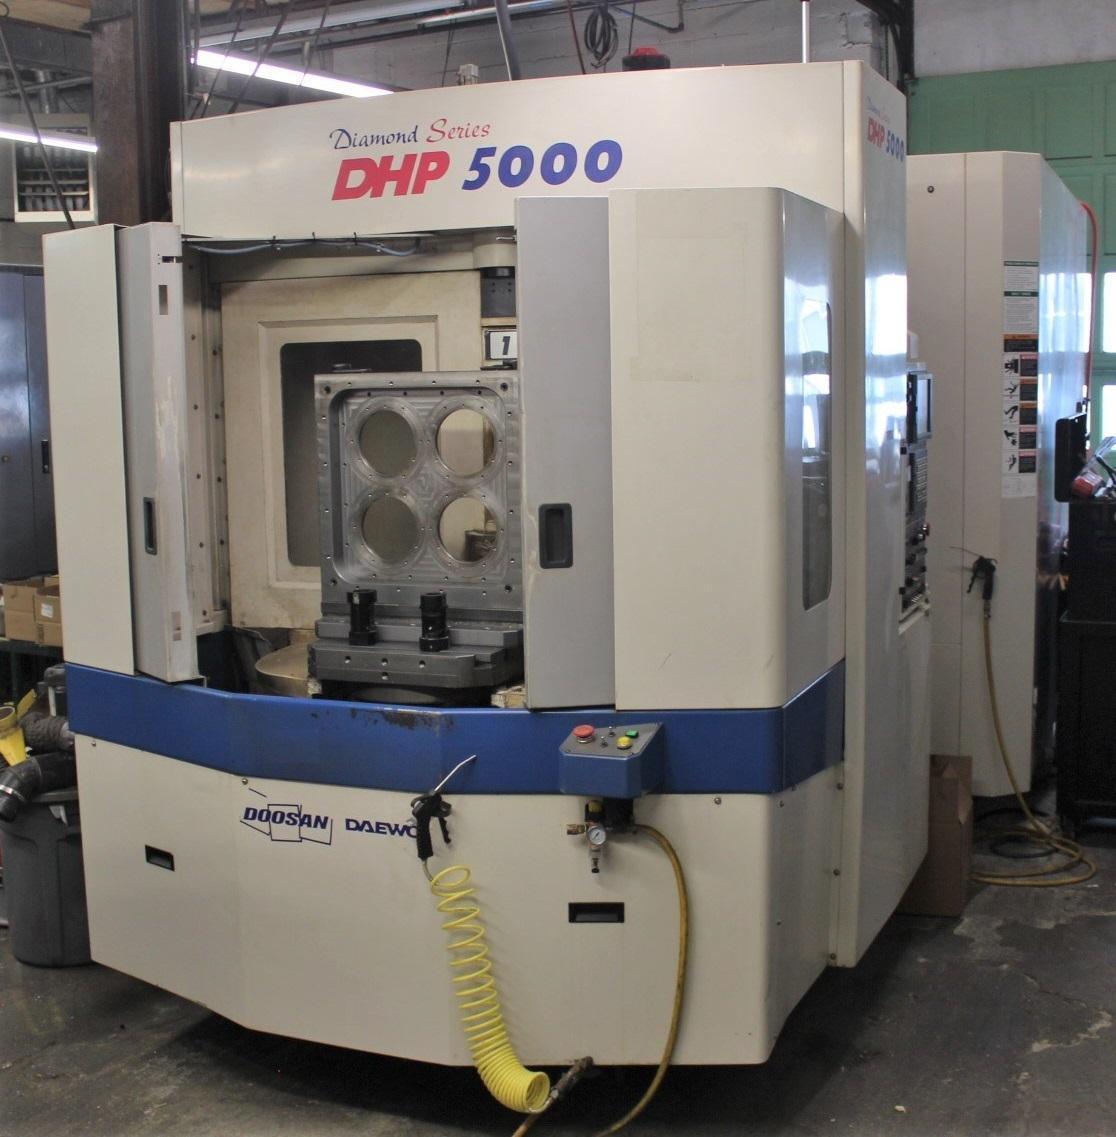 Doosan DHP 5000 CNC Horizontal Machining Center 2006